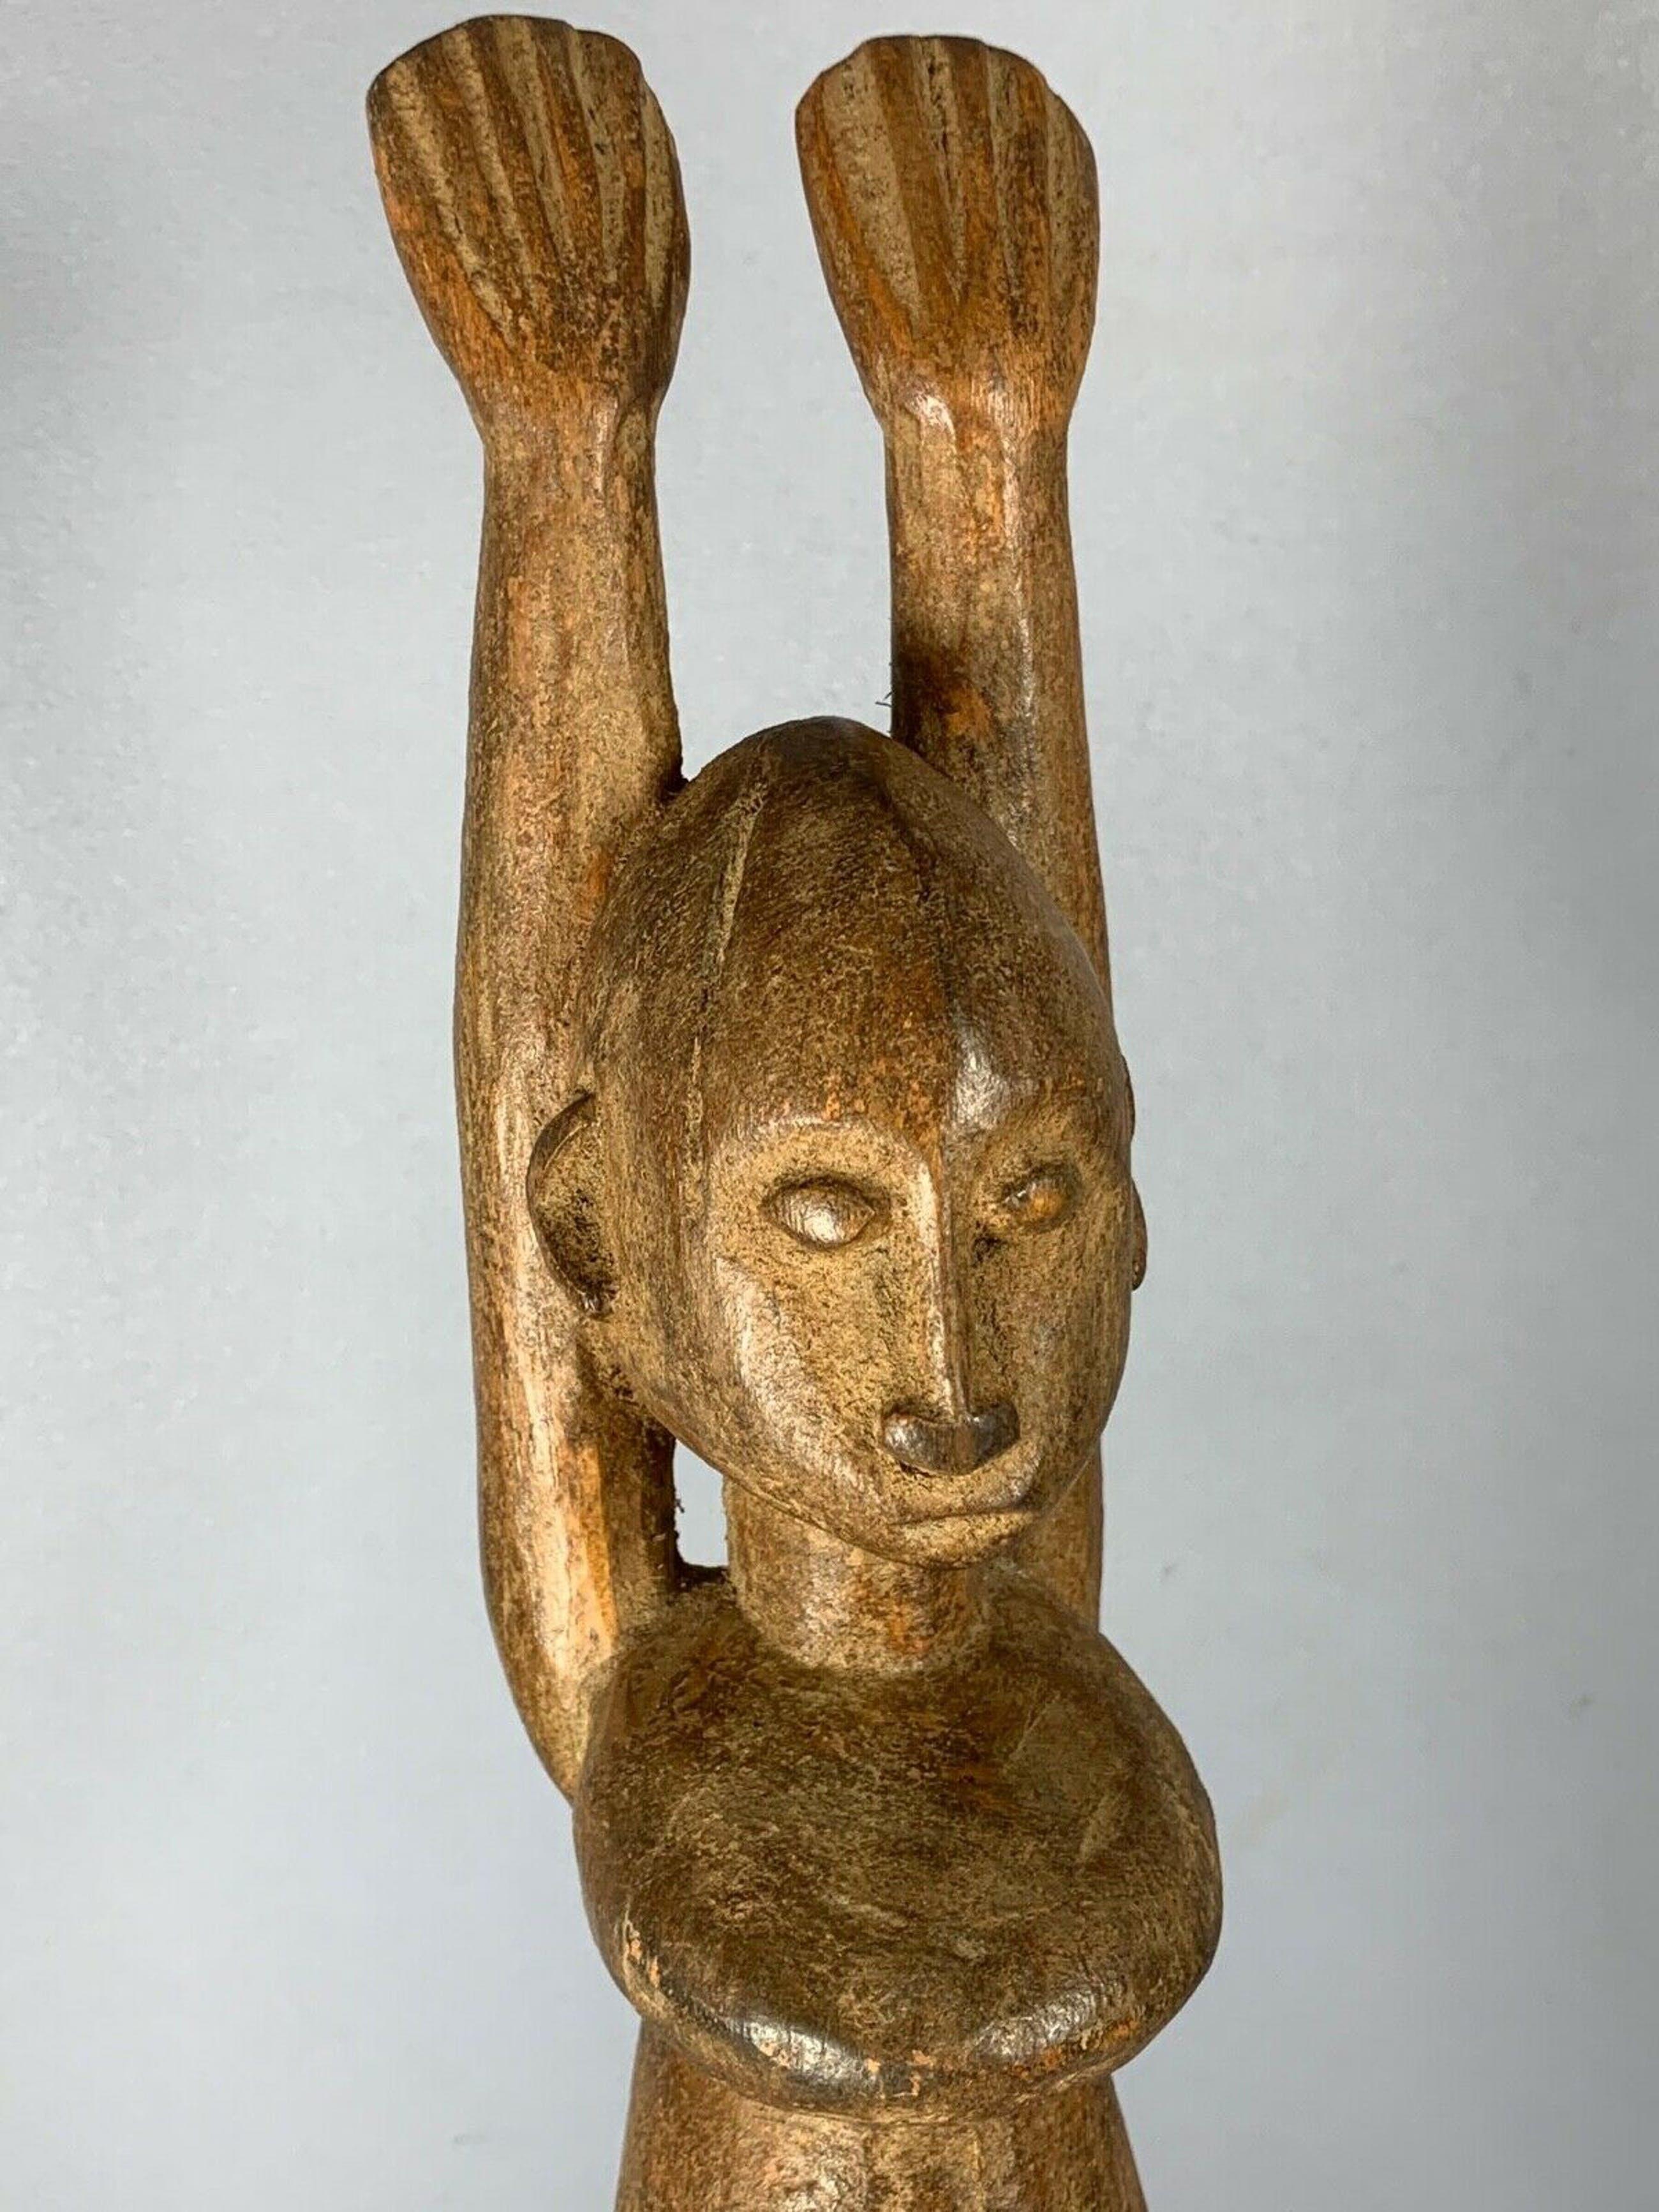 Dogon - 201136 - Old African Dogon Figure - Mali. kopen? Bied vanaf 75!